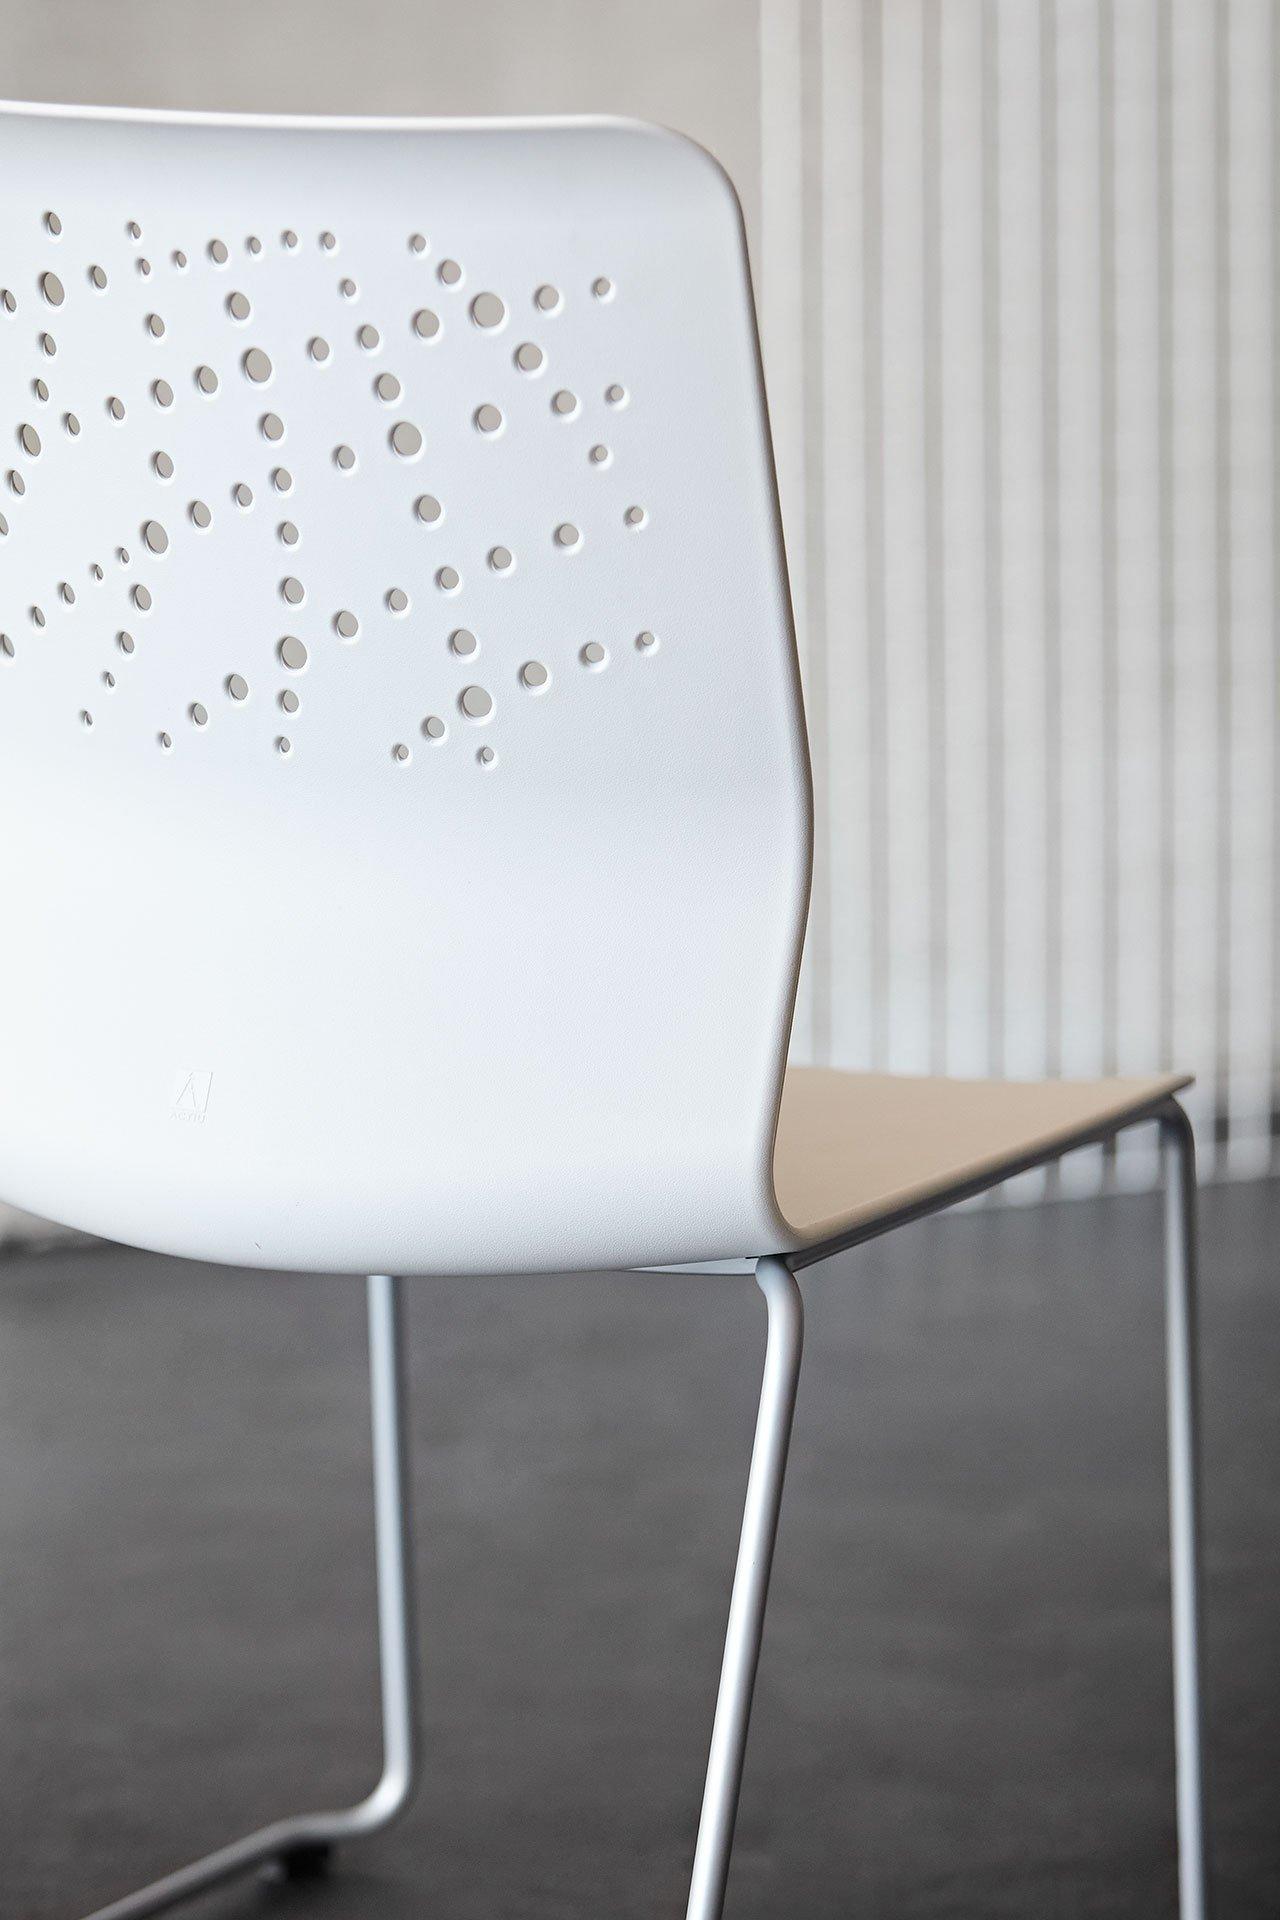 Urban Block Chair from Actiu, designed by Javier Cunado